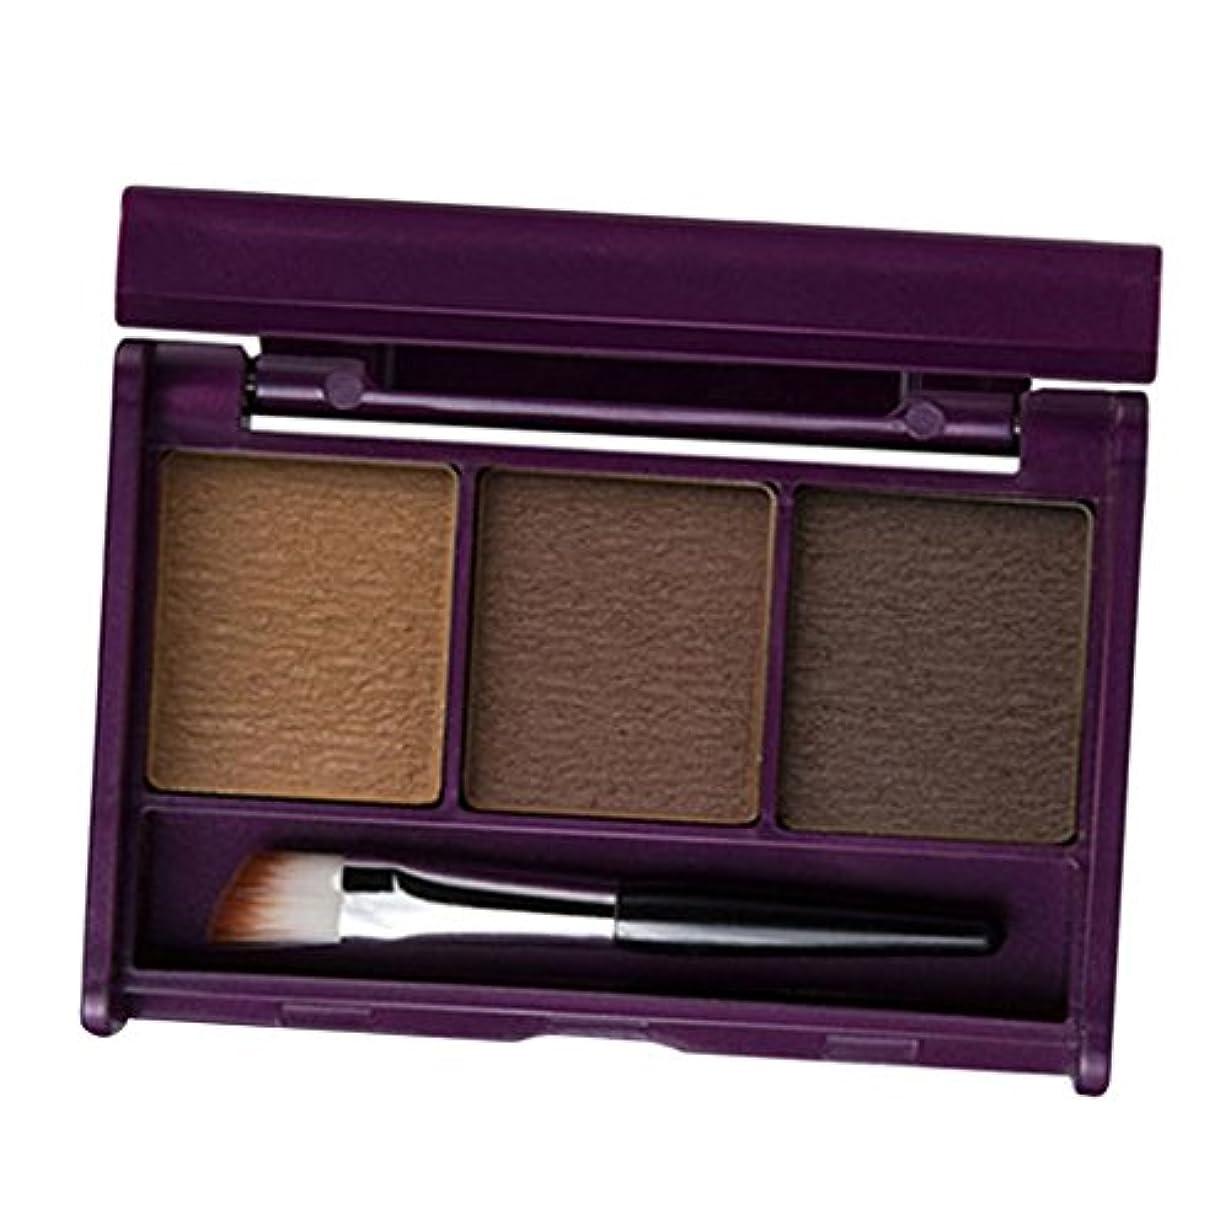 Sharplace アイブローパウダー 眉毛 ブラシ付き メイクパレット 自然 防水 長持ち 3色選べる - 02